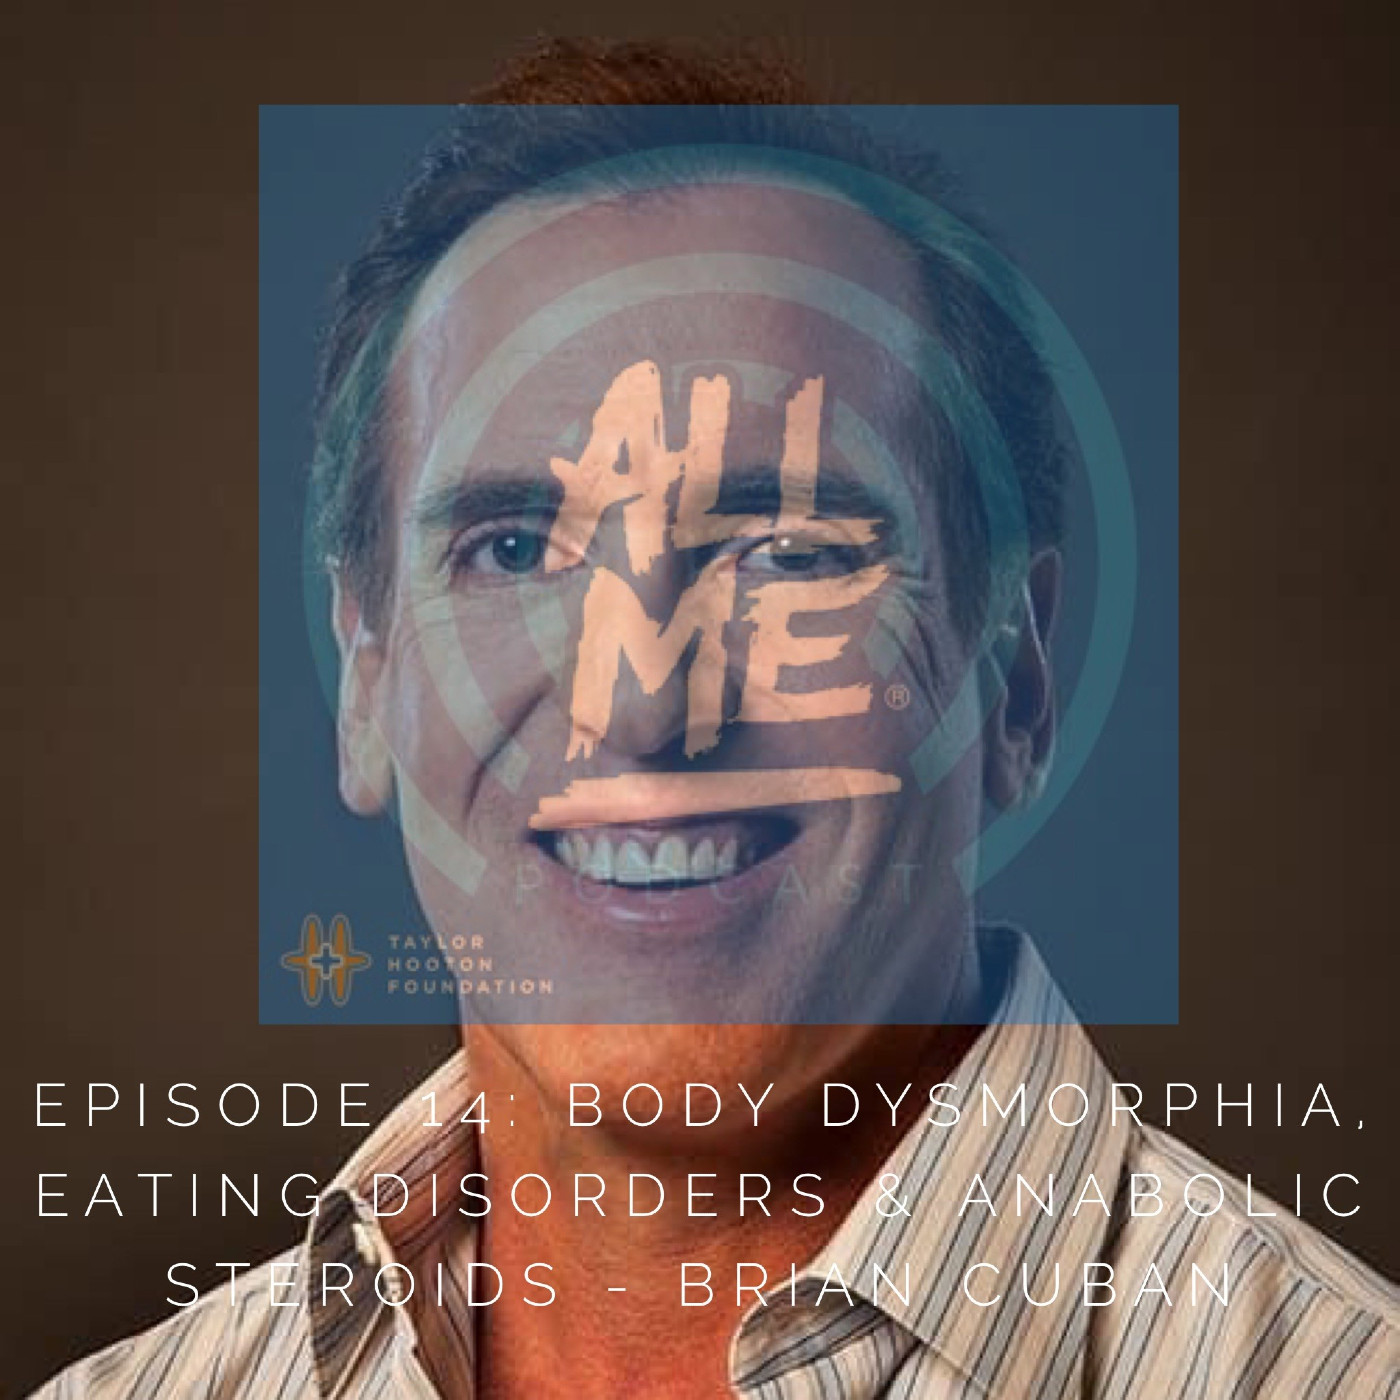 Episode 14: Body Dysmorphia, Eating Disorders & Anabolic Steroids – Brian Cuban